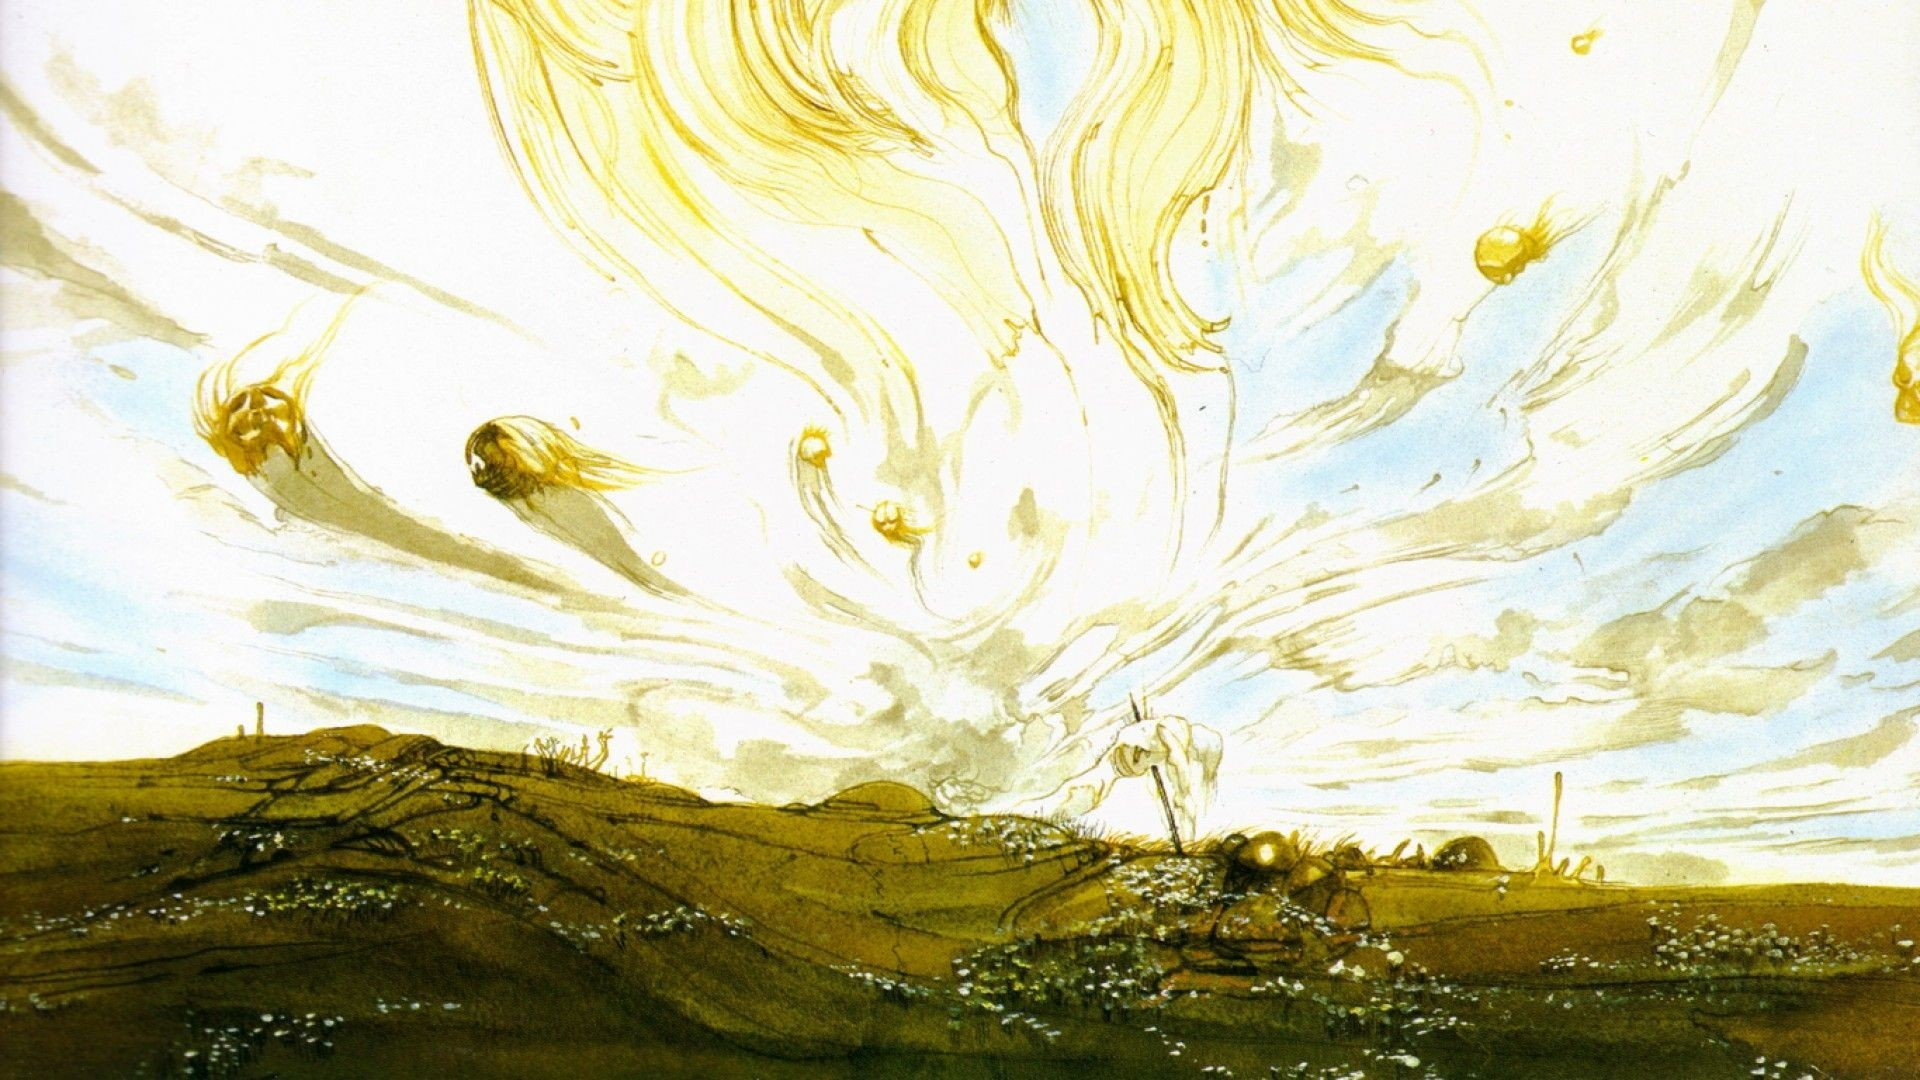 Best images about Yoshitaka Amano on Pinterest San juan 1600×1200 Yoshitaka  Amano Wallpapers (